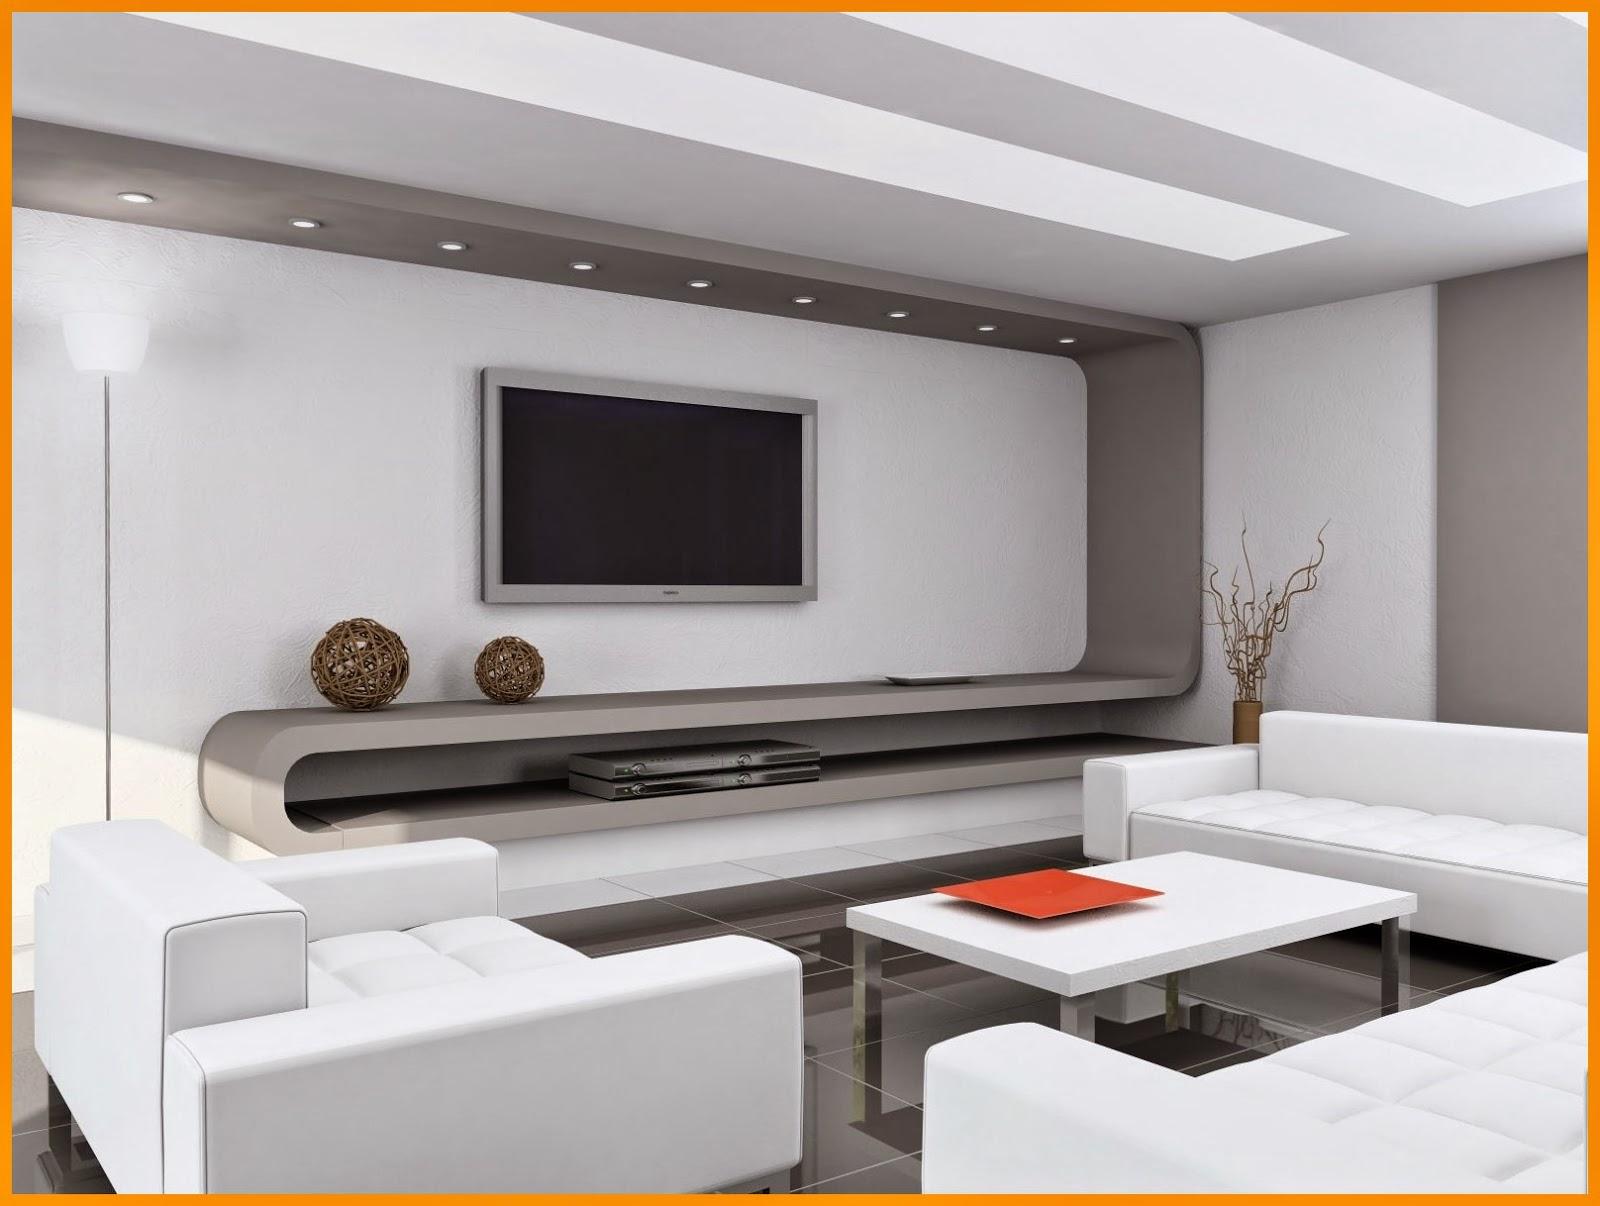 Alimustang home design future vevs interior design - Future home interior design ...